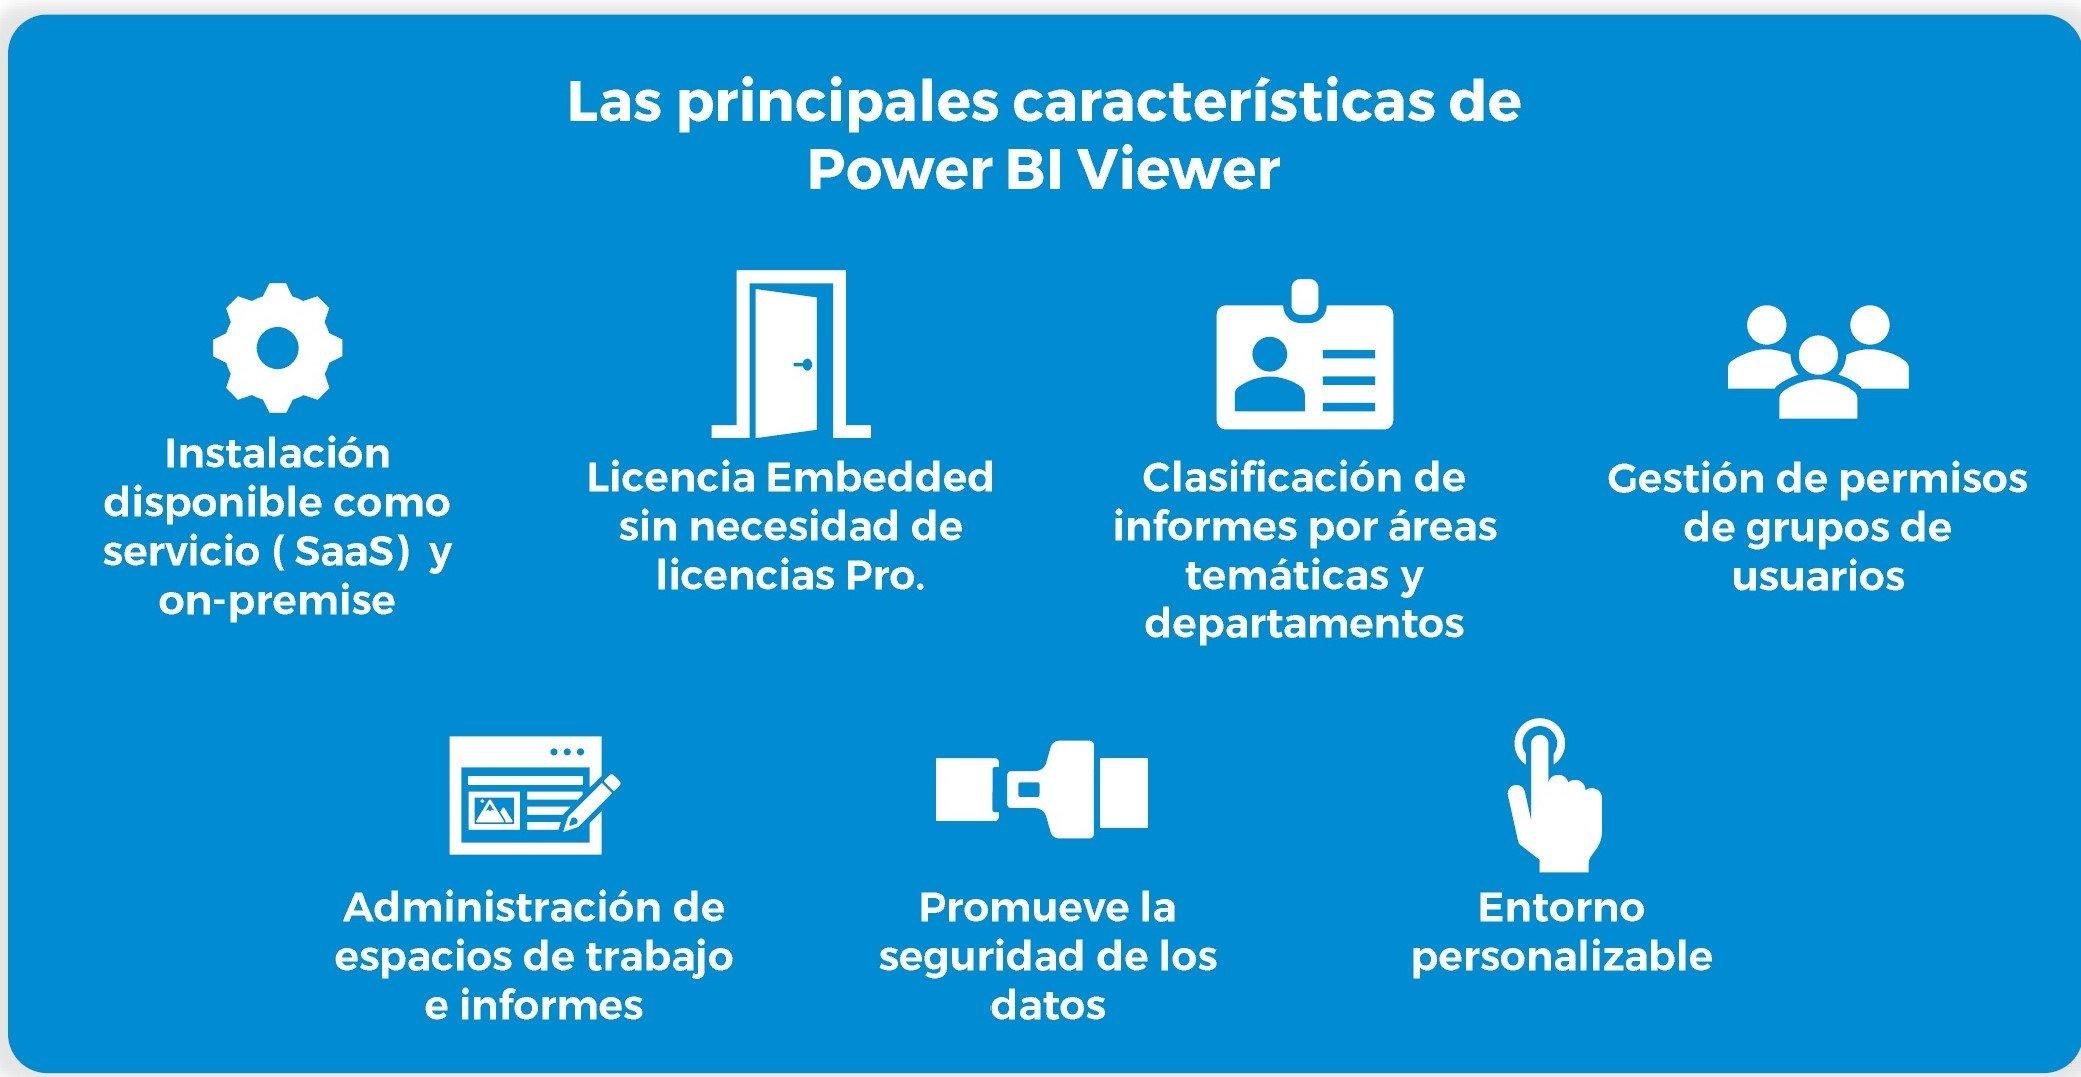 principales características de Power BI Viewer-1